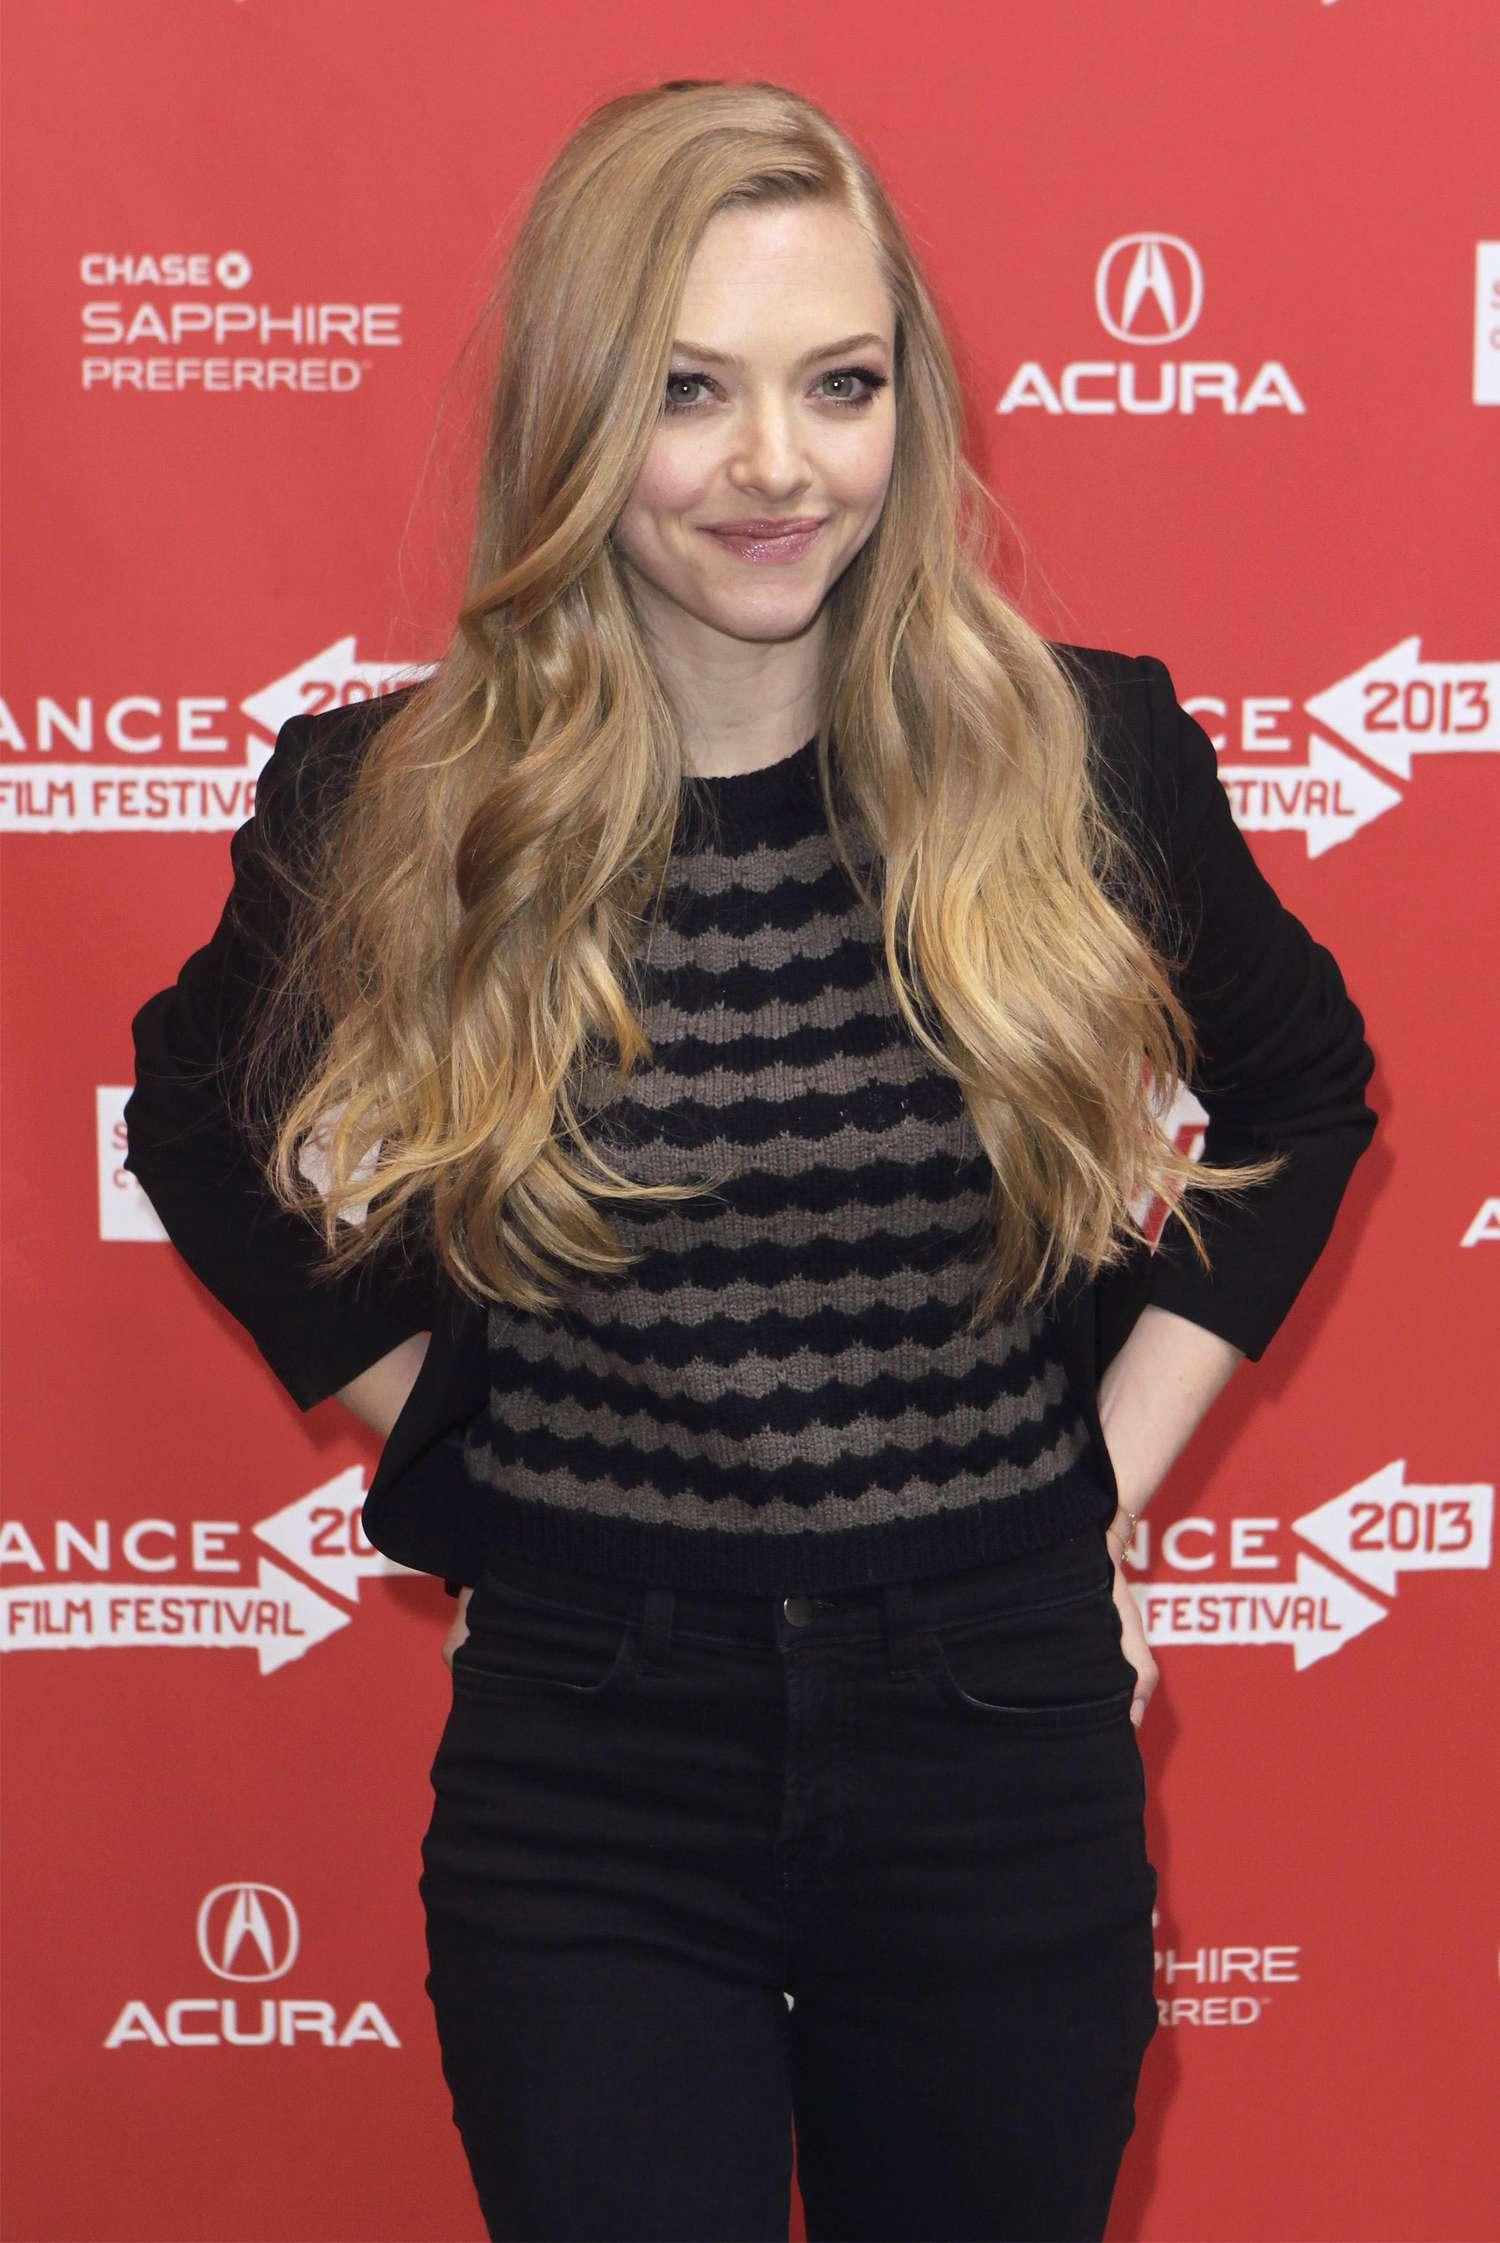 Amanda Seyfried at 2013 Sundance Film Festival - Lovelace Premiere